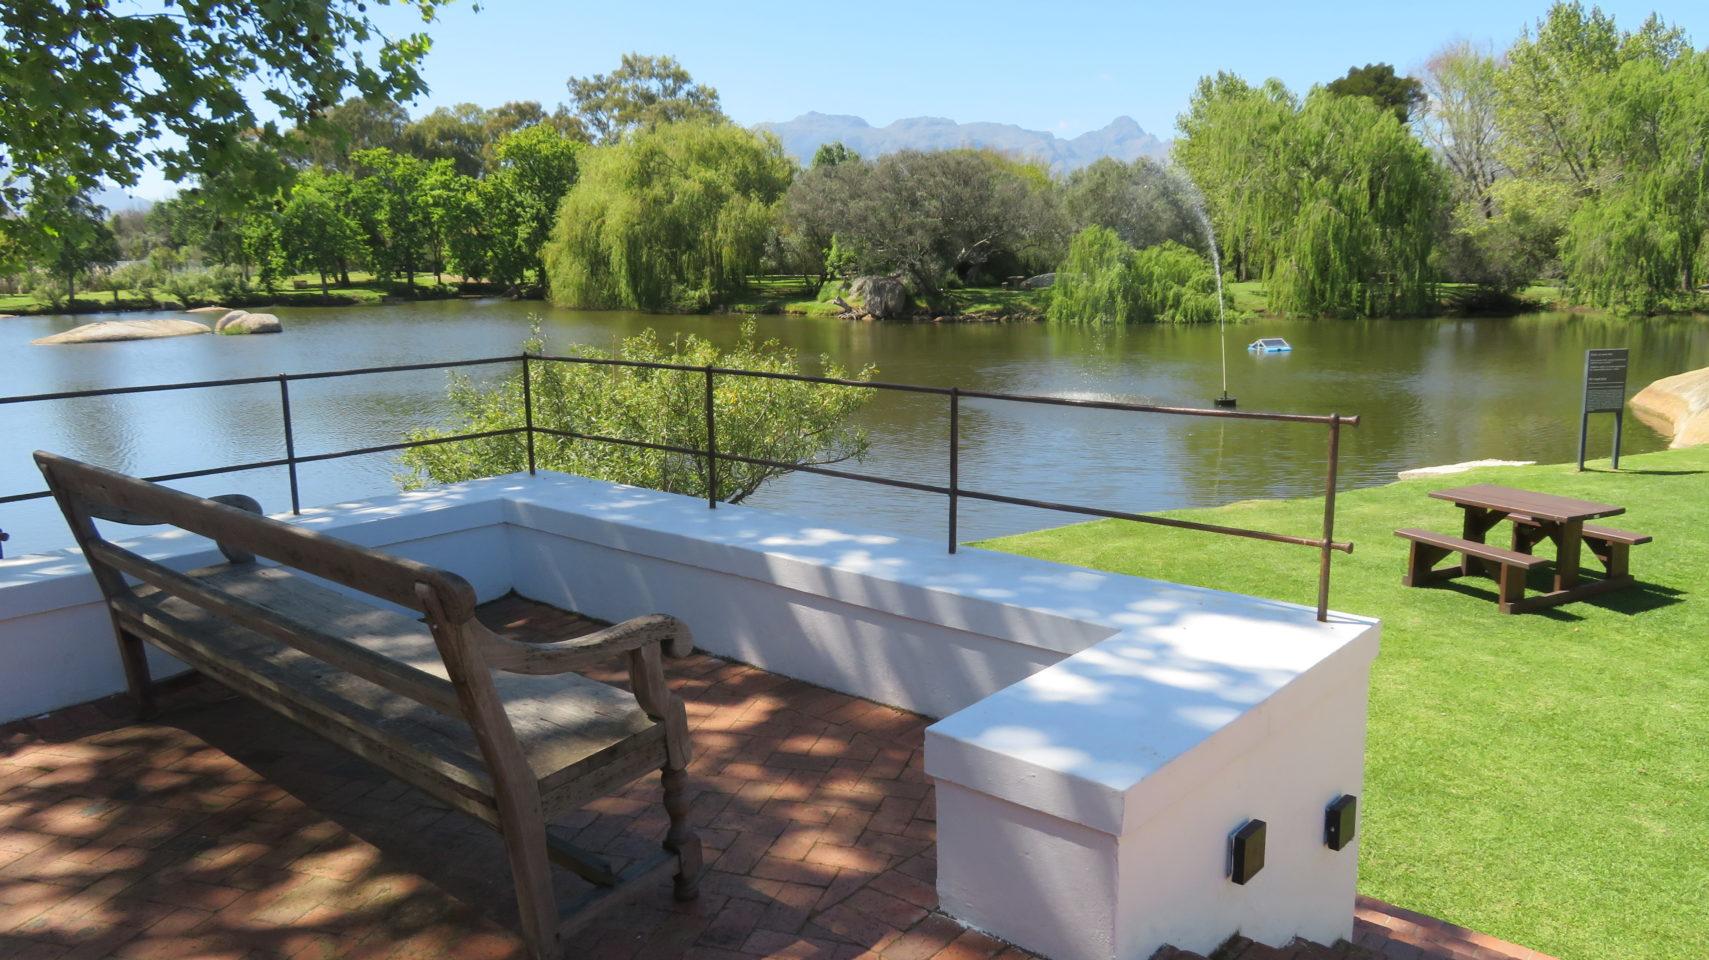 Spier Wine Farm in Stellenbosch, South Africa